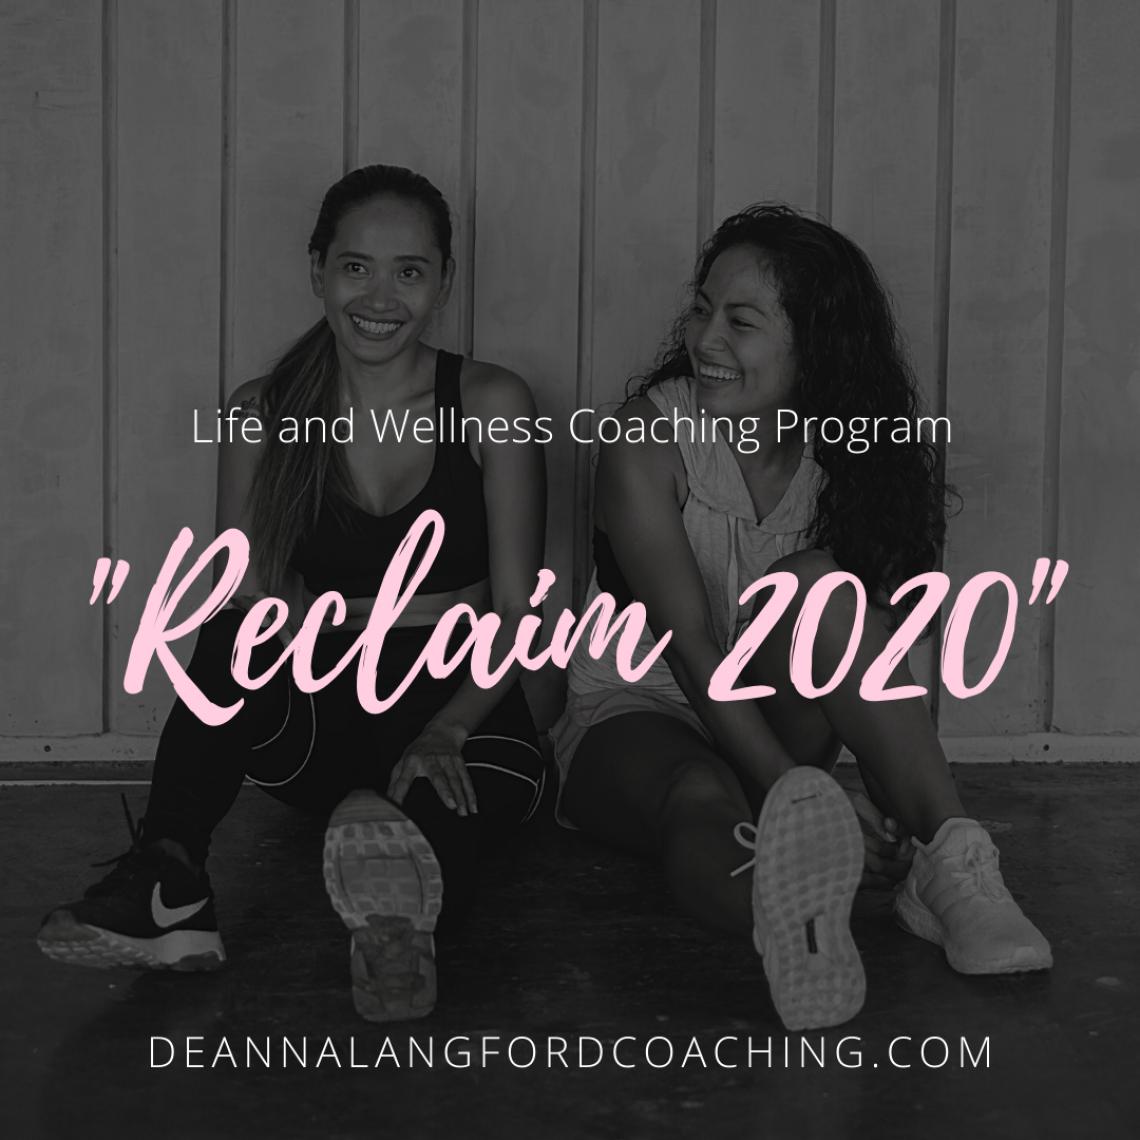 Reclaim 2020 Wellness and Life Coaching Program